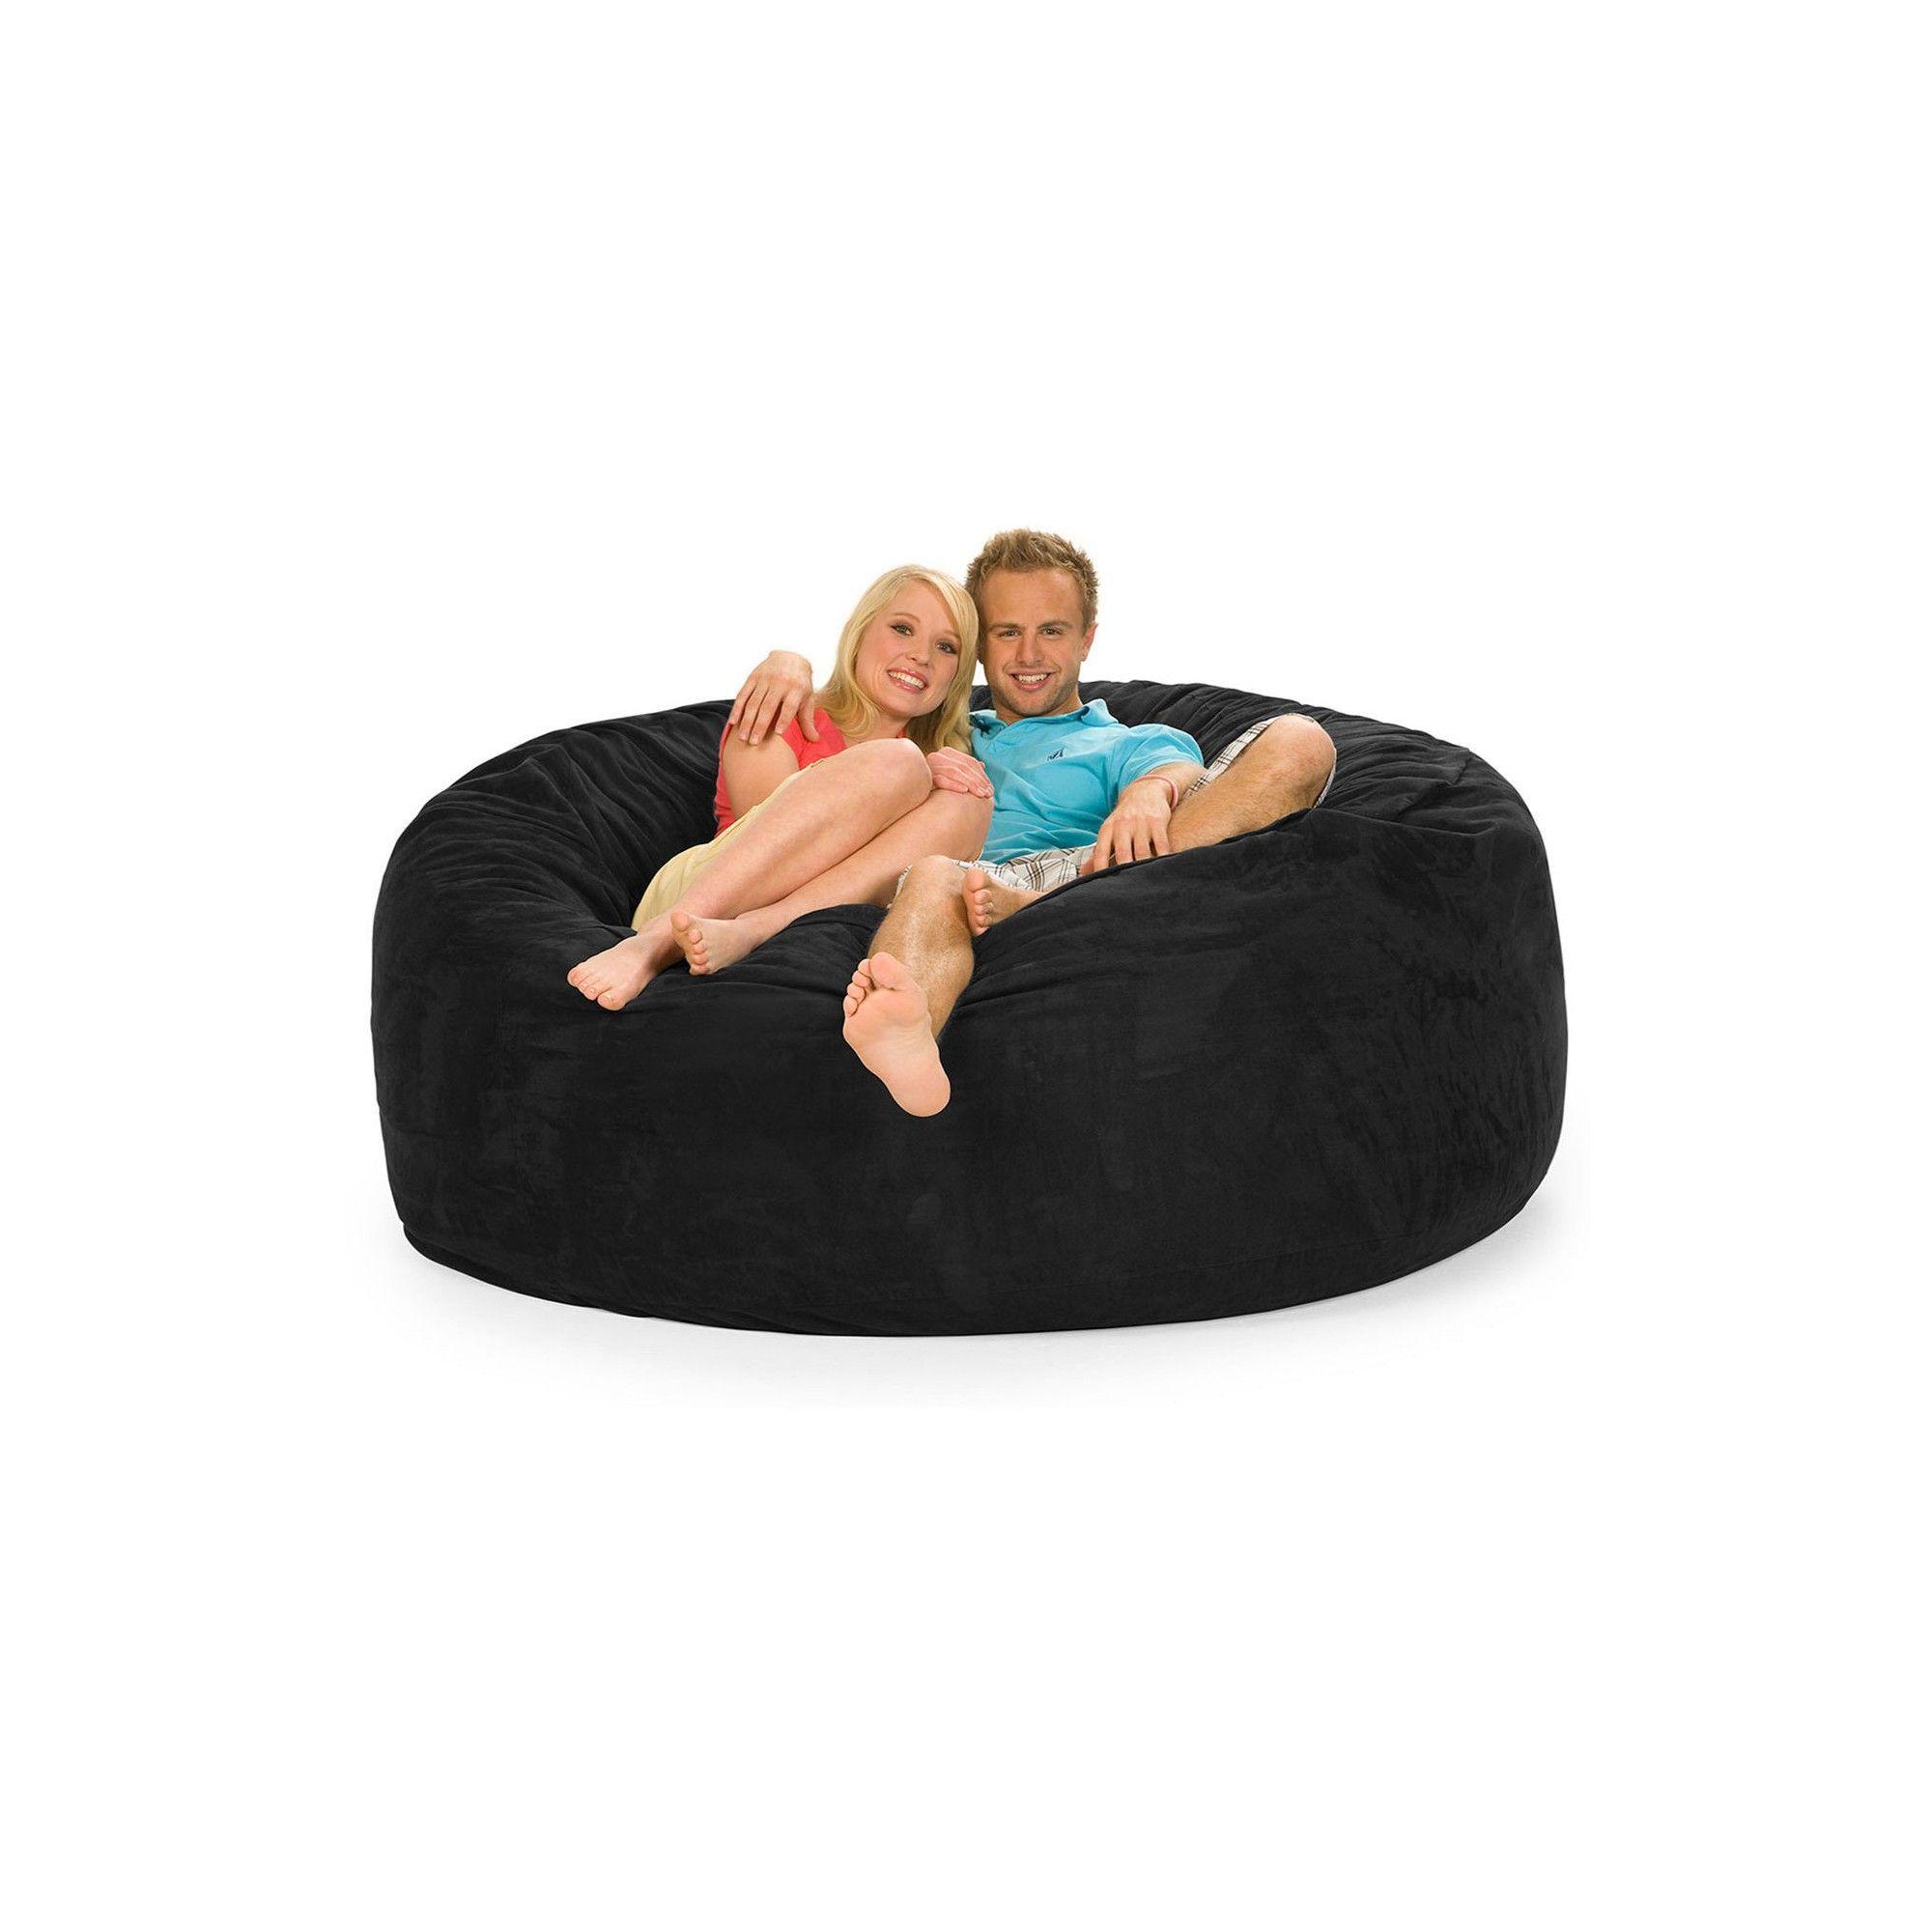 Phenomenal Huge Memory Foam Bean Bag 6 Ft Black Relax Sacks Tuck Uwap Interior Chair Design Uwaporg